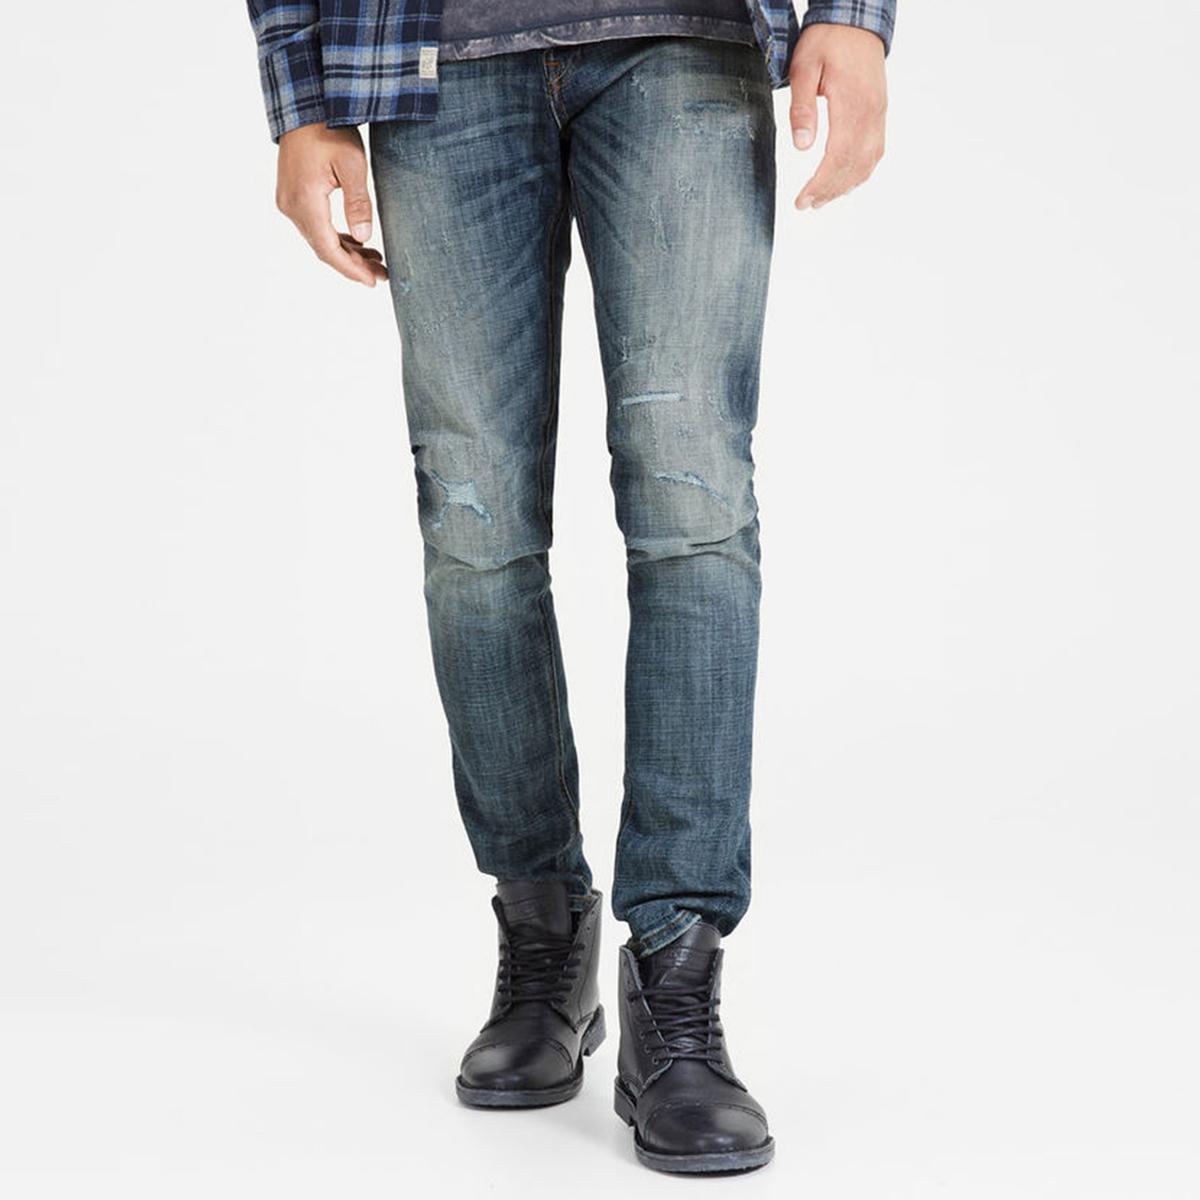 Джинсы узкие JJIGLENN ORIGINAL GE 988 джинсы versace collection джинсы узкие